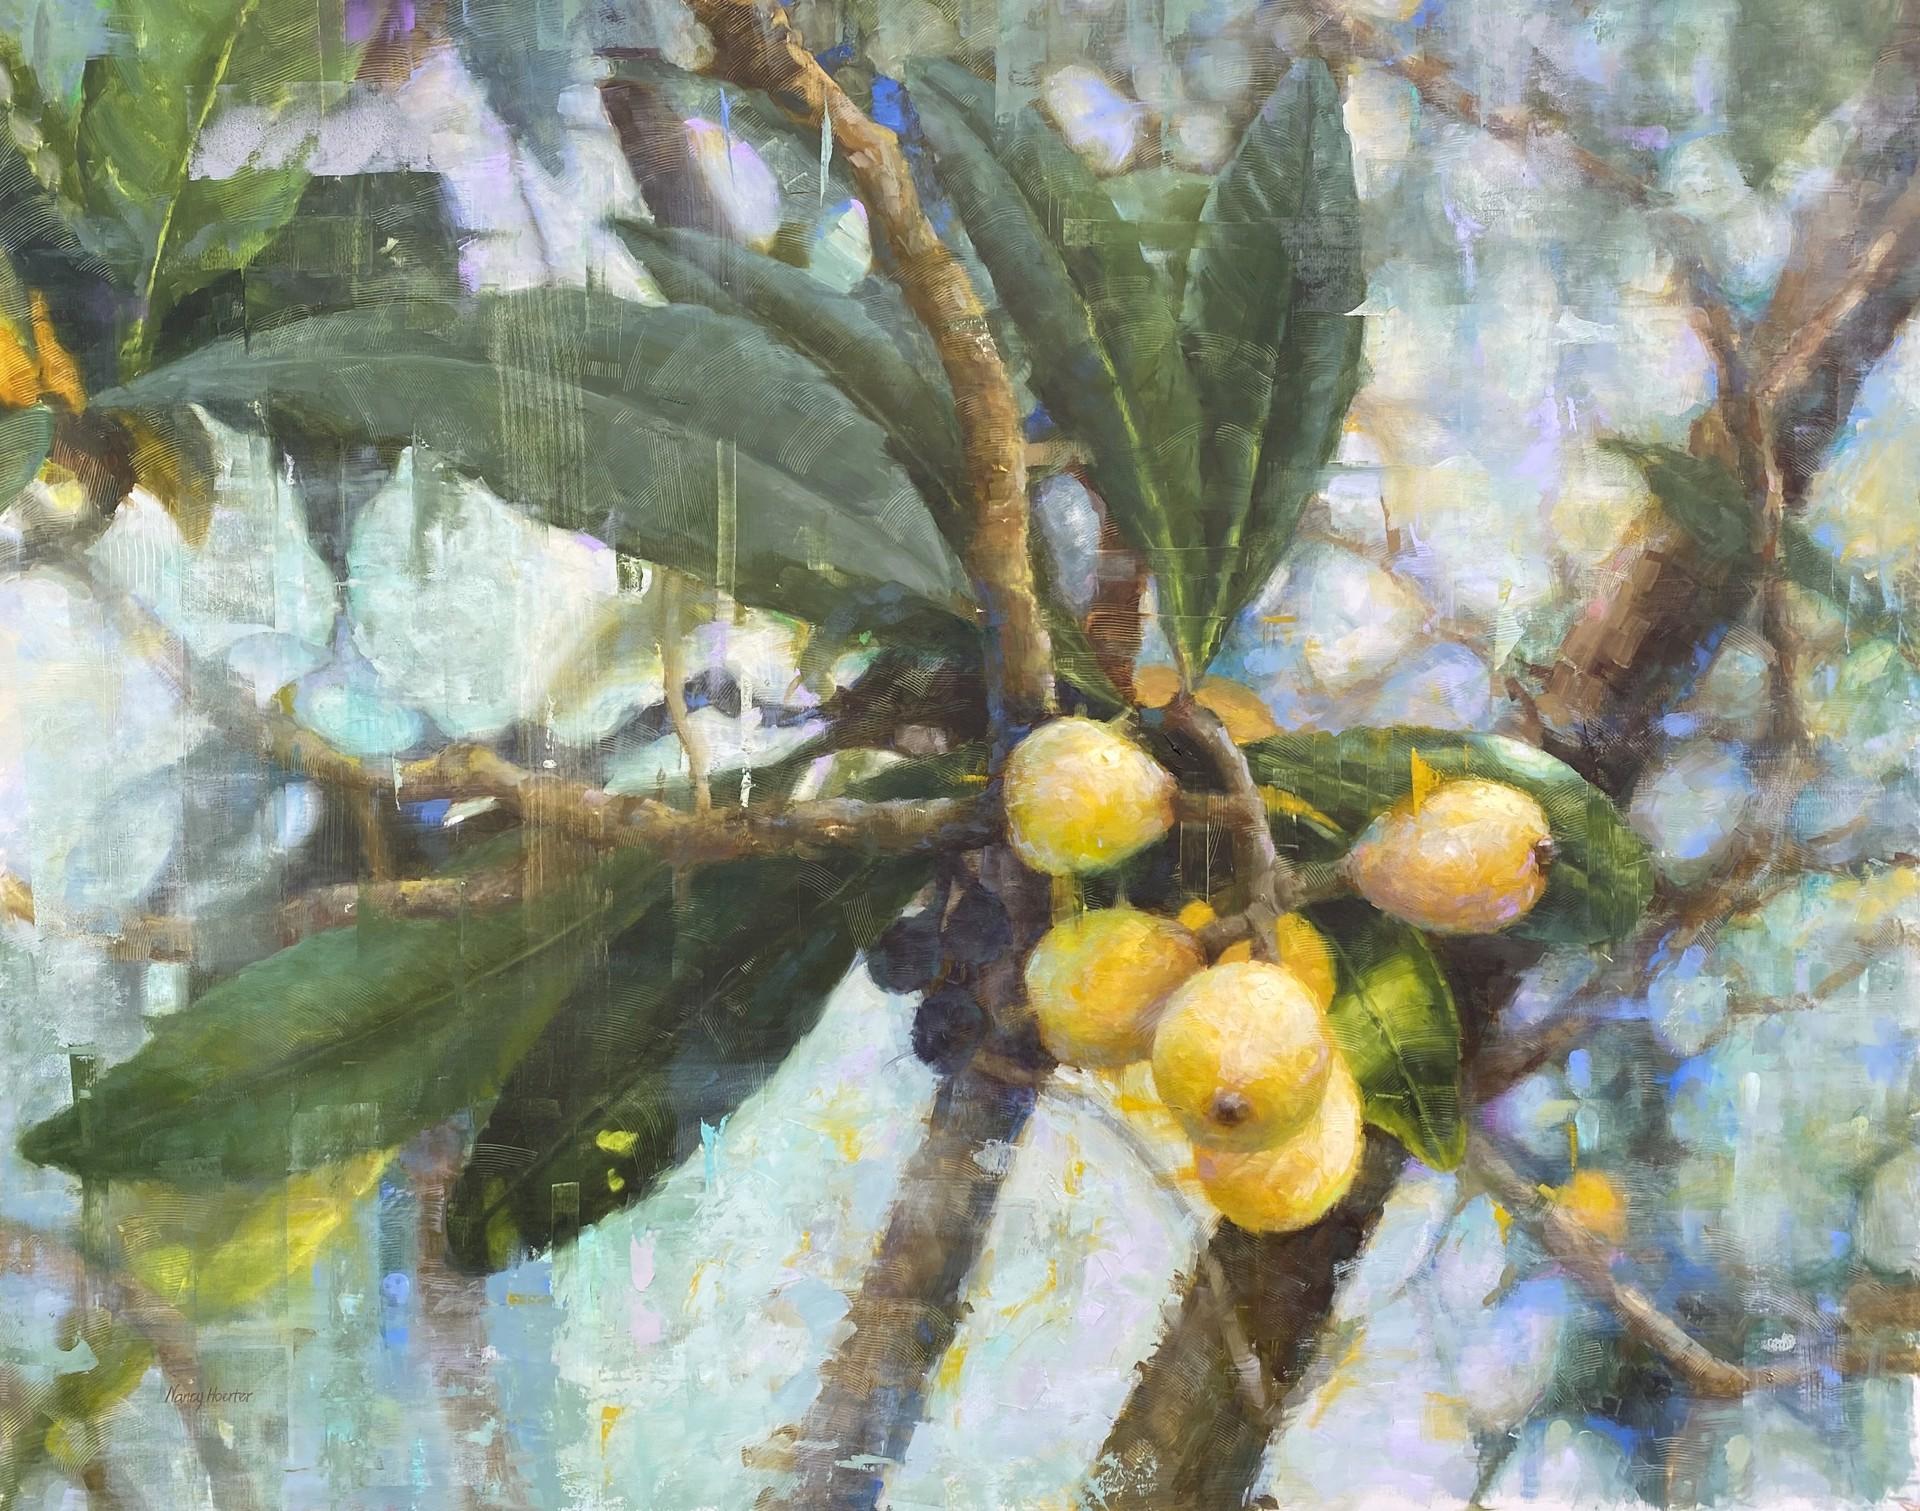 Summer Cluster by Nancy Hoerter